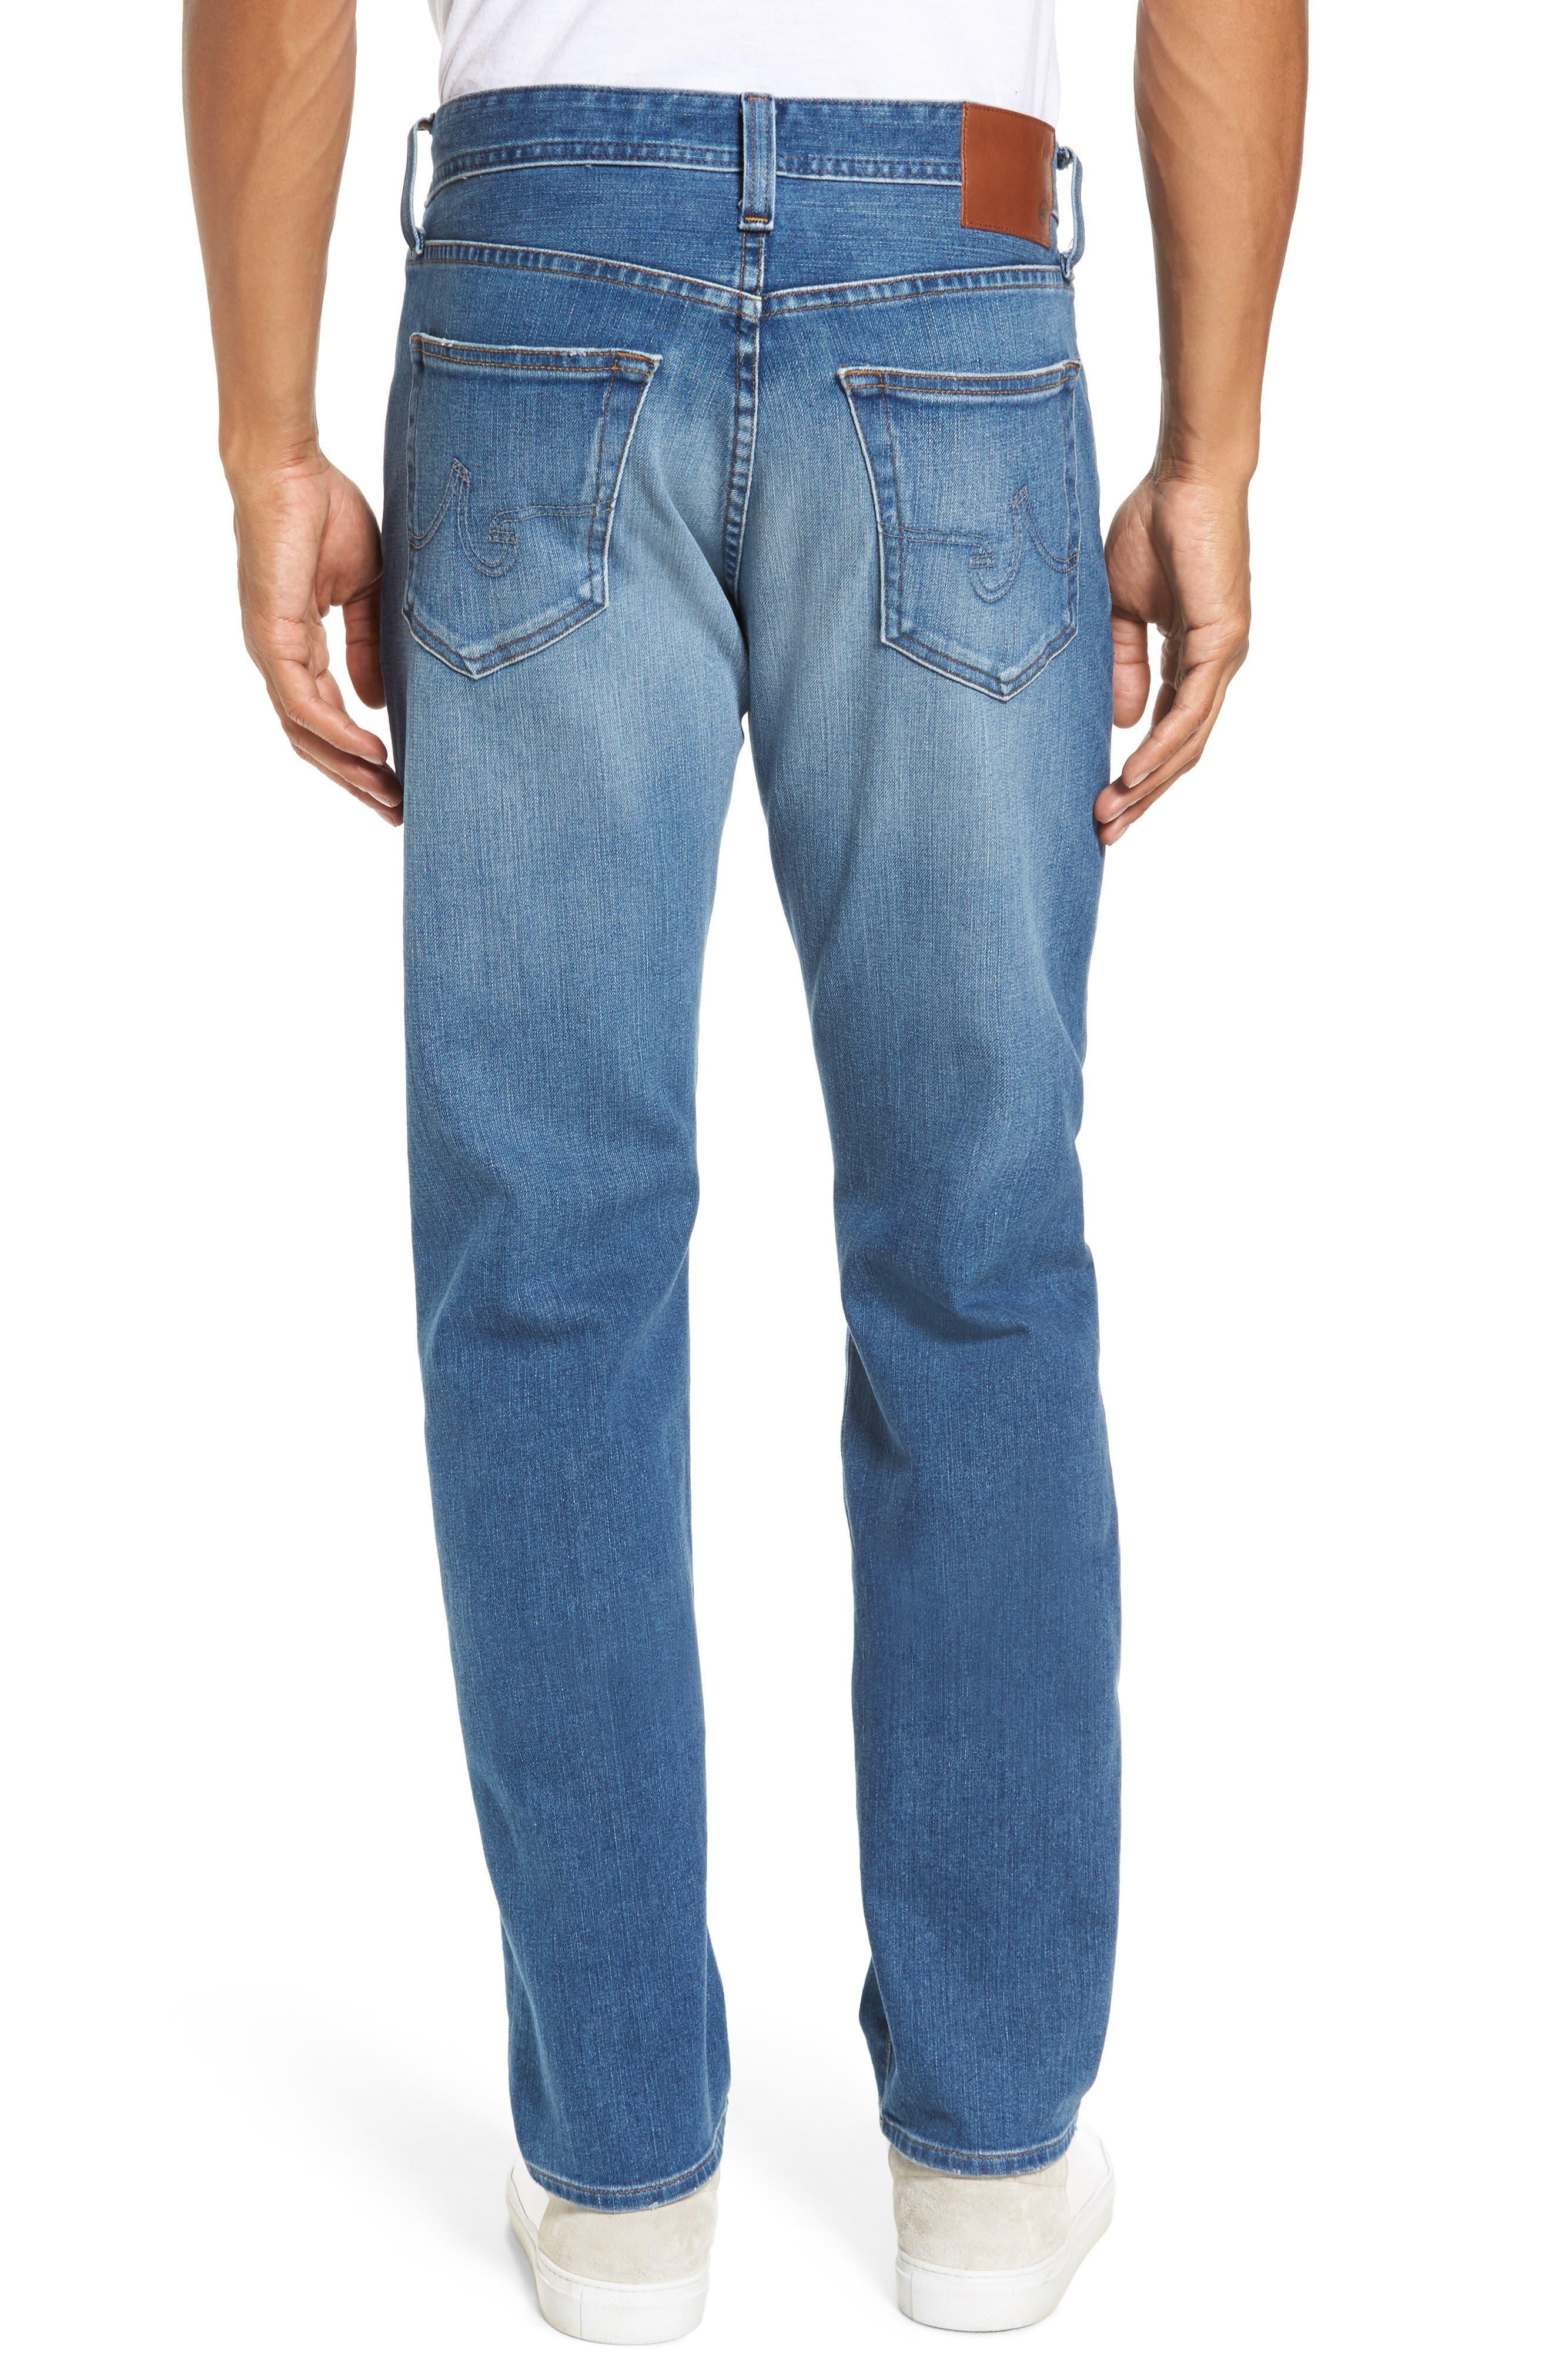 Graduate Slim Straight Fit Jeans,                             Alternate thumbnail 2, color,                             456